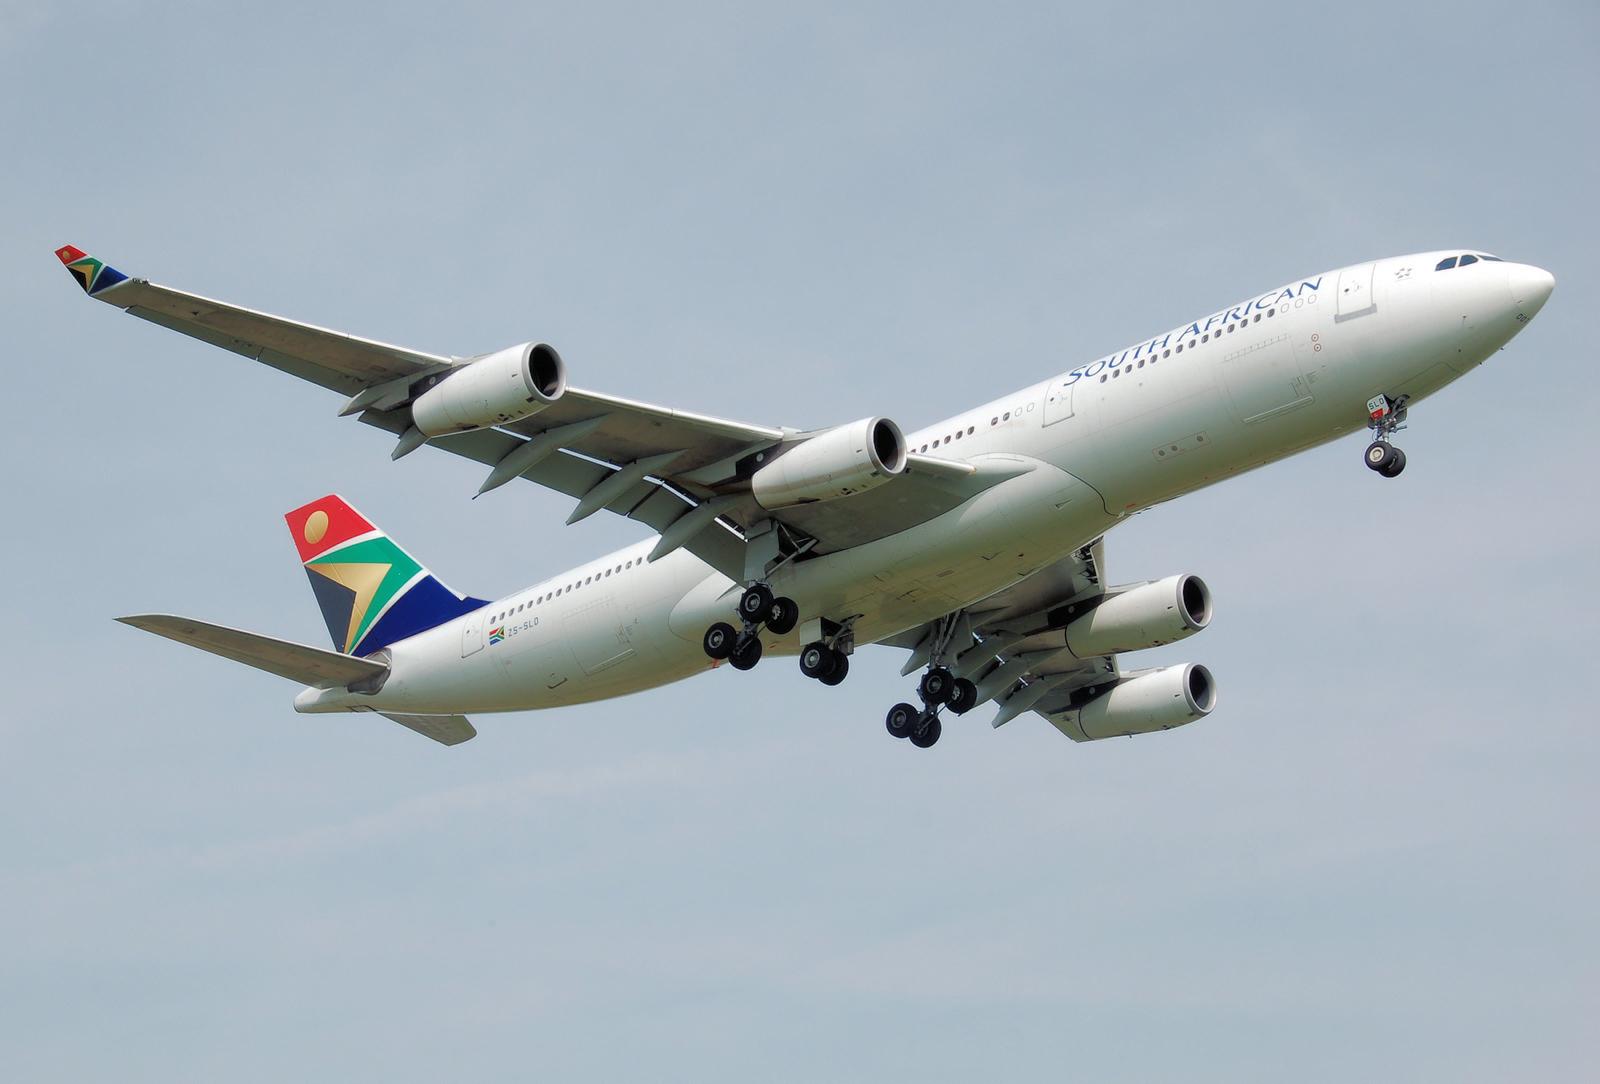 File Saa A340 200 Zs Sld Lands London Heathrow Arp Jpg